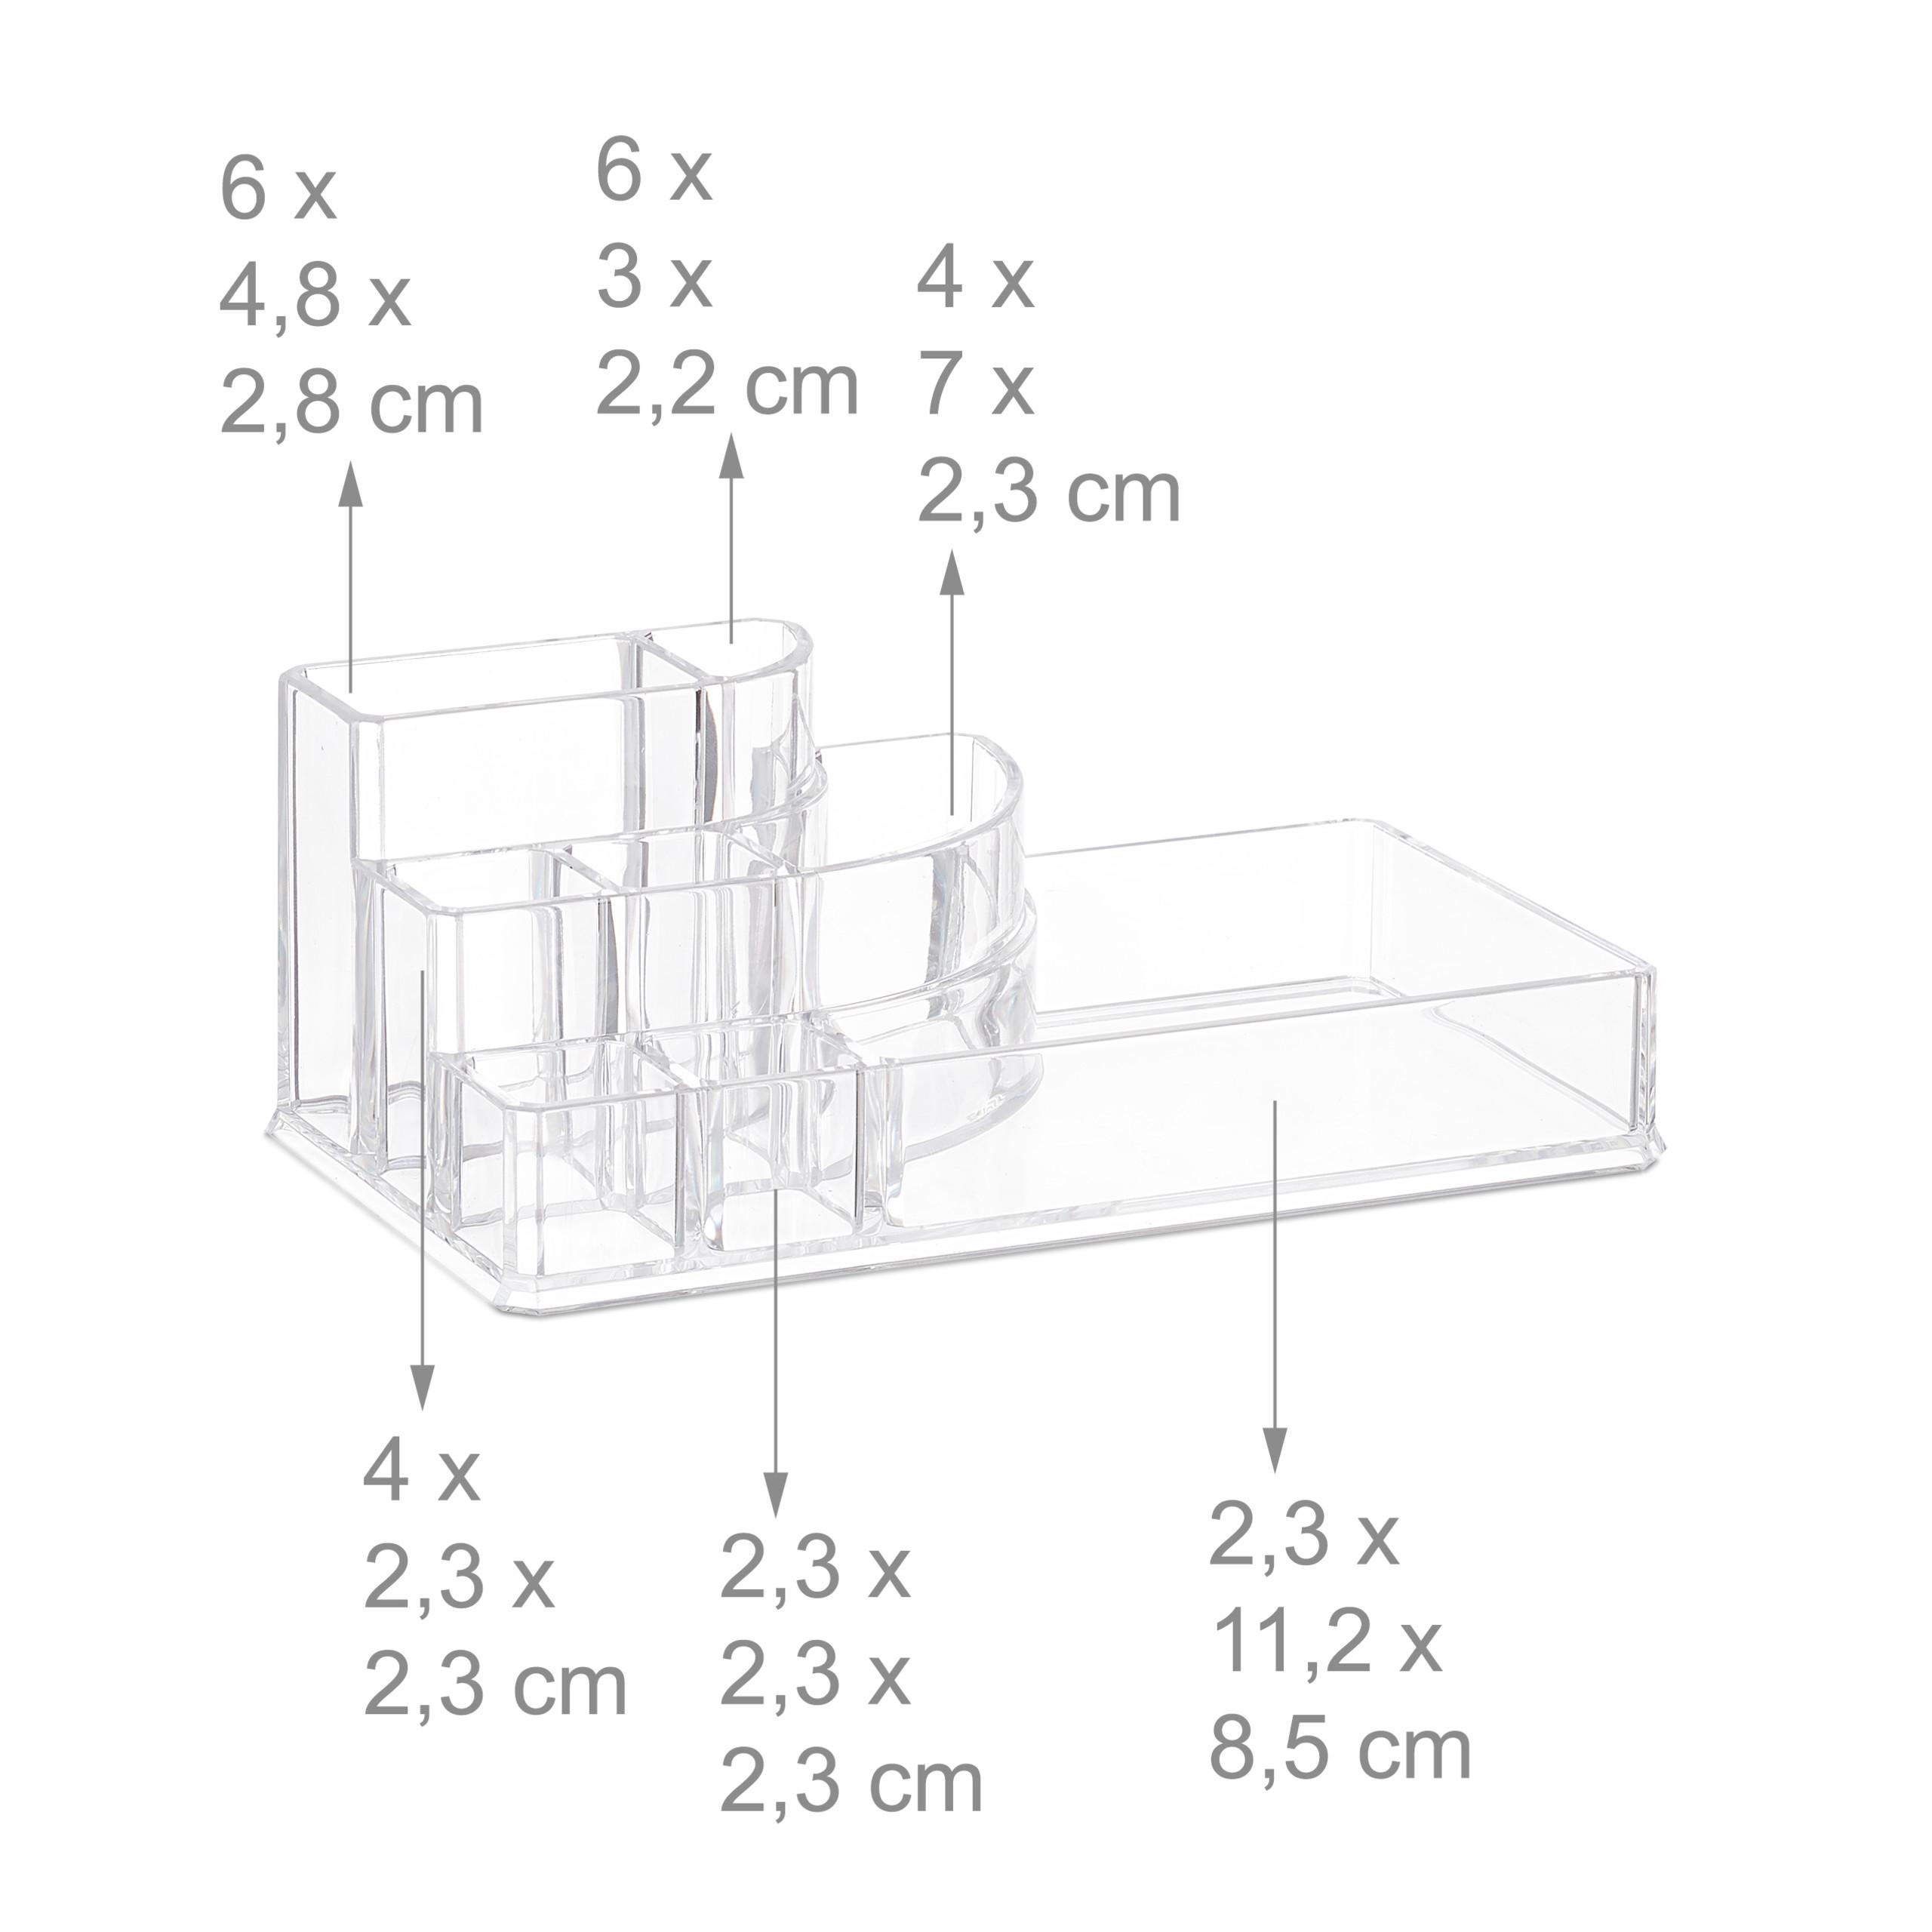 make-up-organizer-acryl-8-vakken-lippenstifthouder-opbergsysteem miniatuur 7